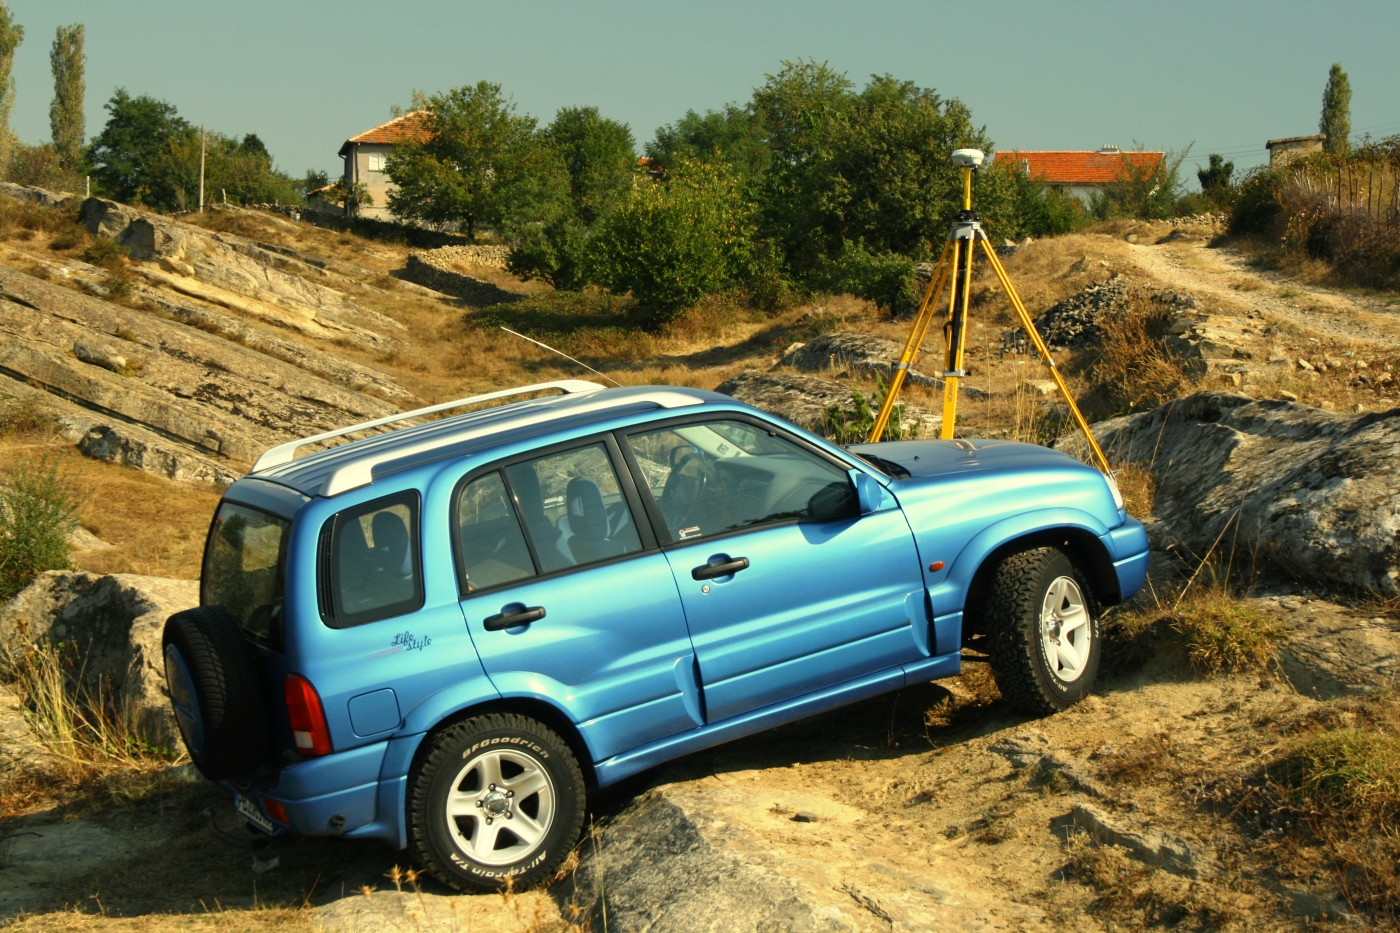 Measurements near Kardjali, Bulgaria